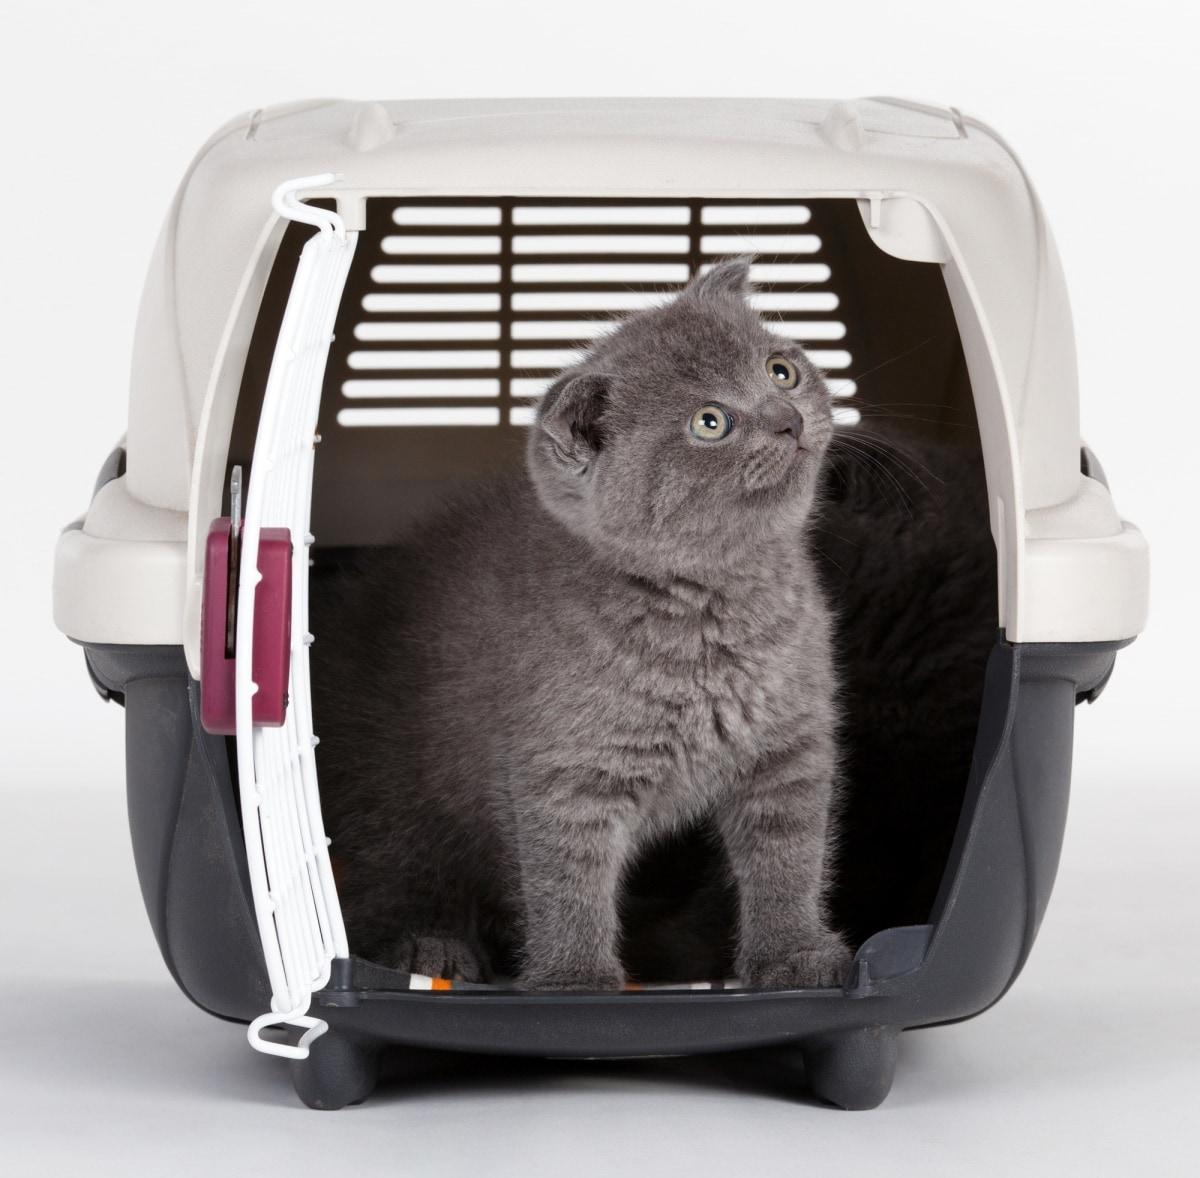 6. Choosing Your Pet's Method of Travel